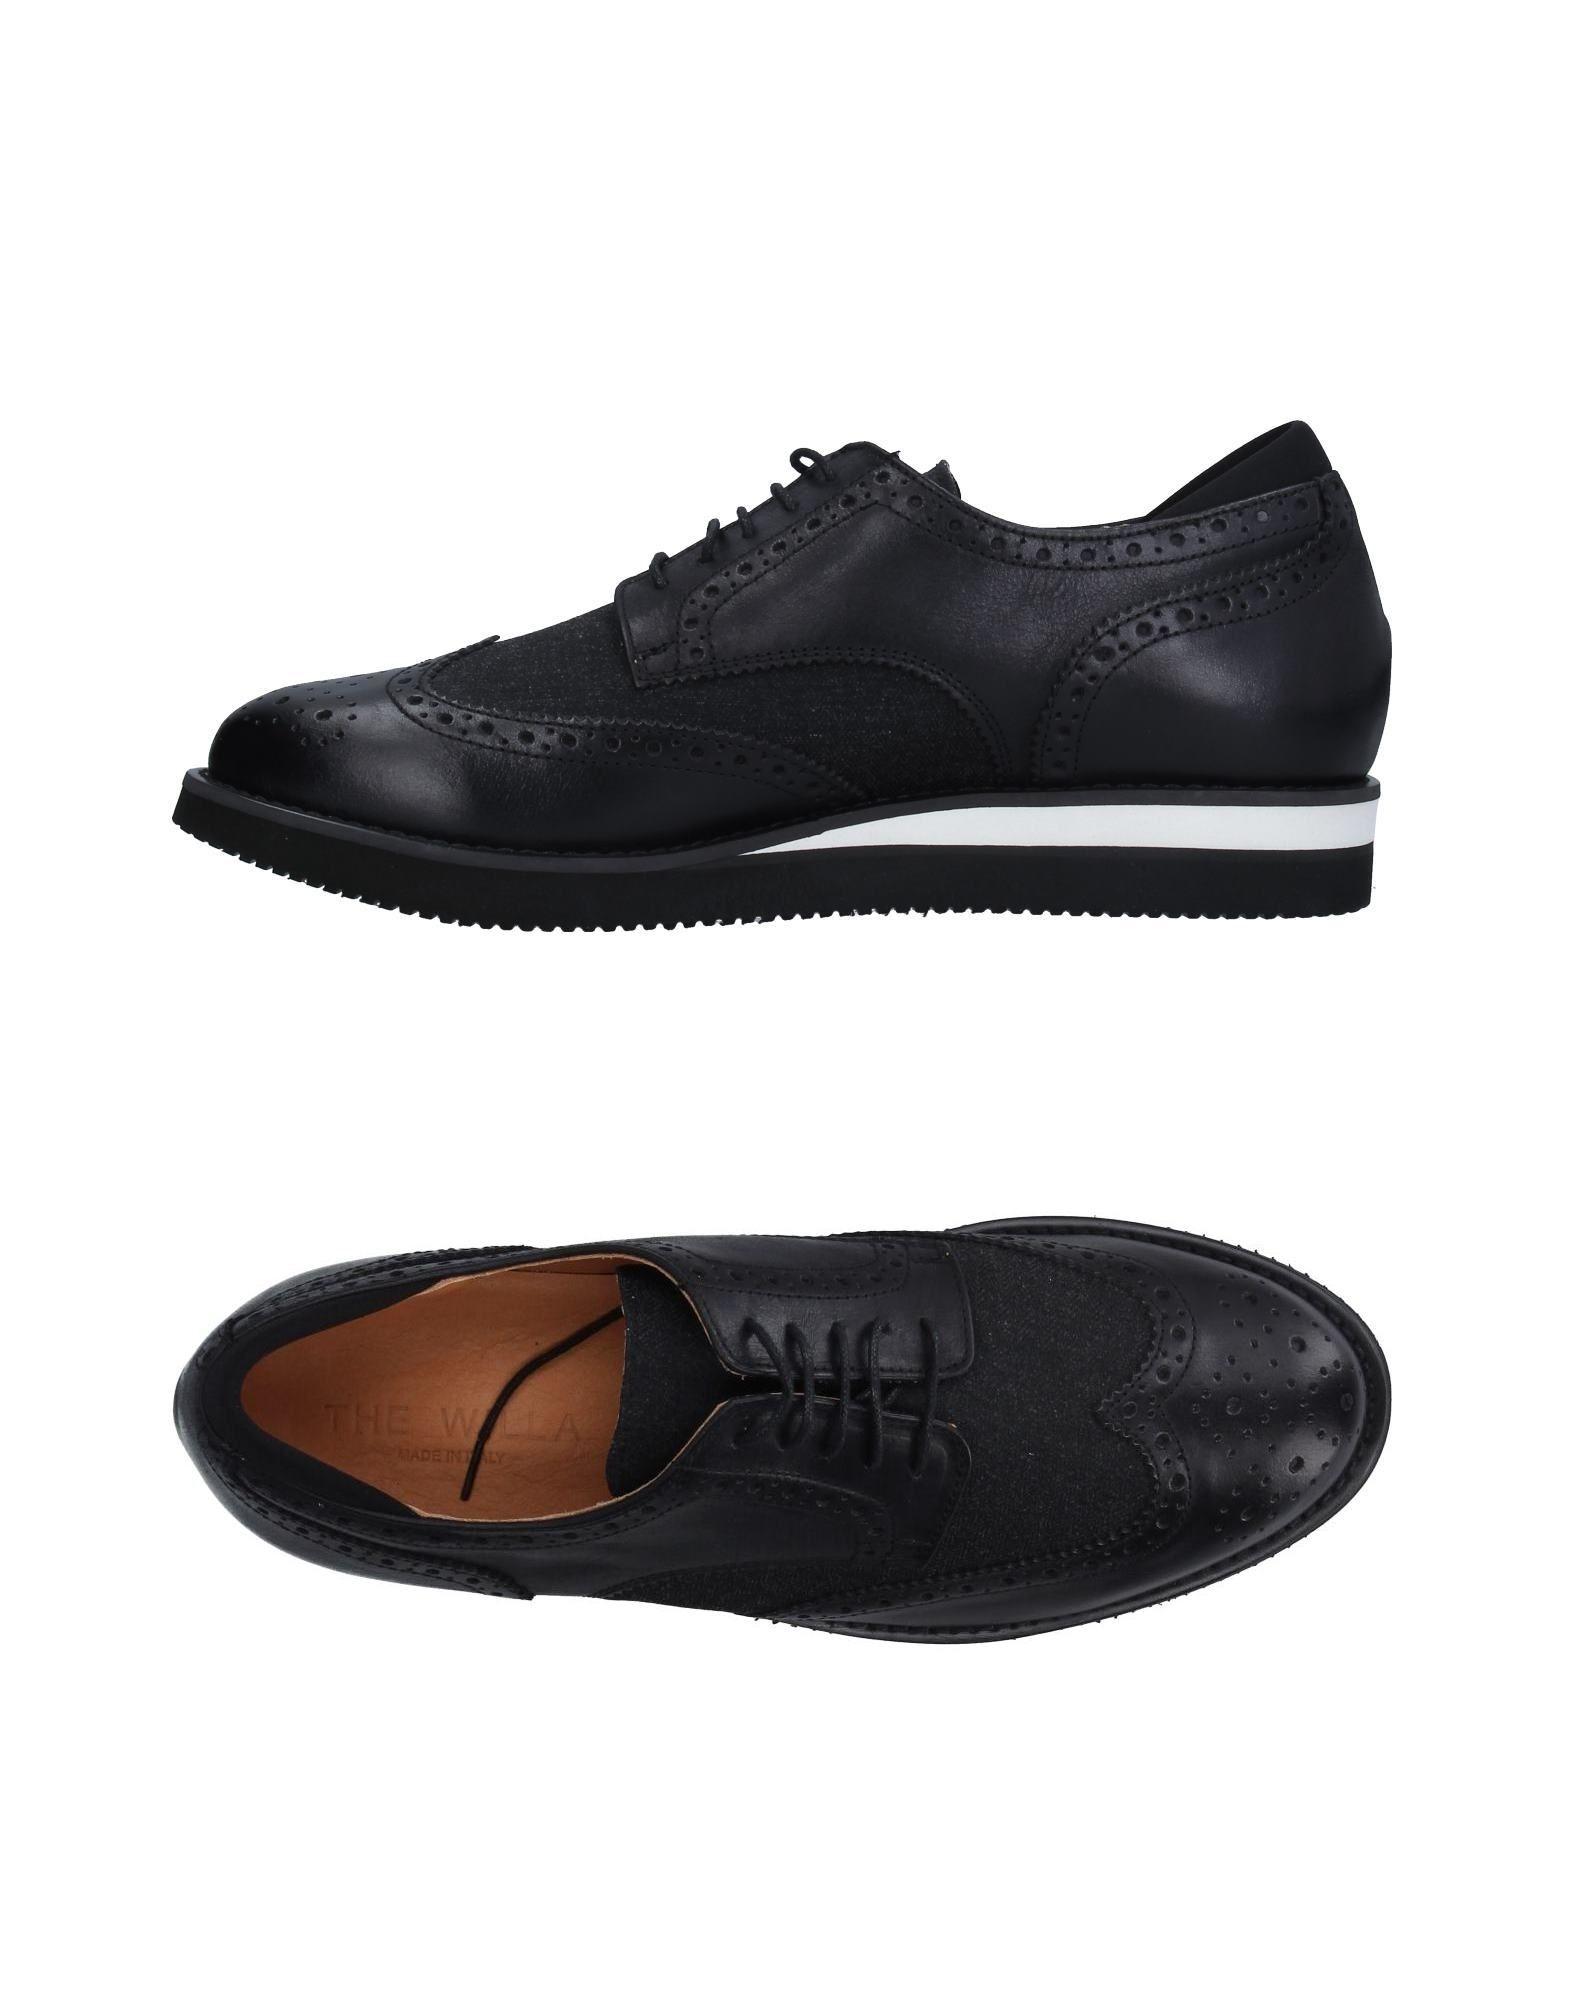 Rabatt echte Schuhe The Willa Schnürschuhe Herren  11242744VL